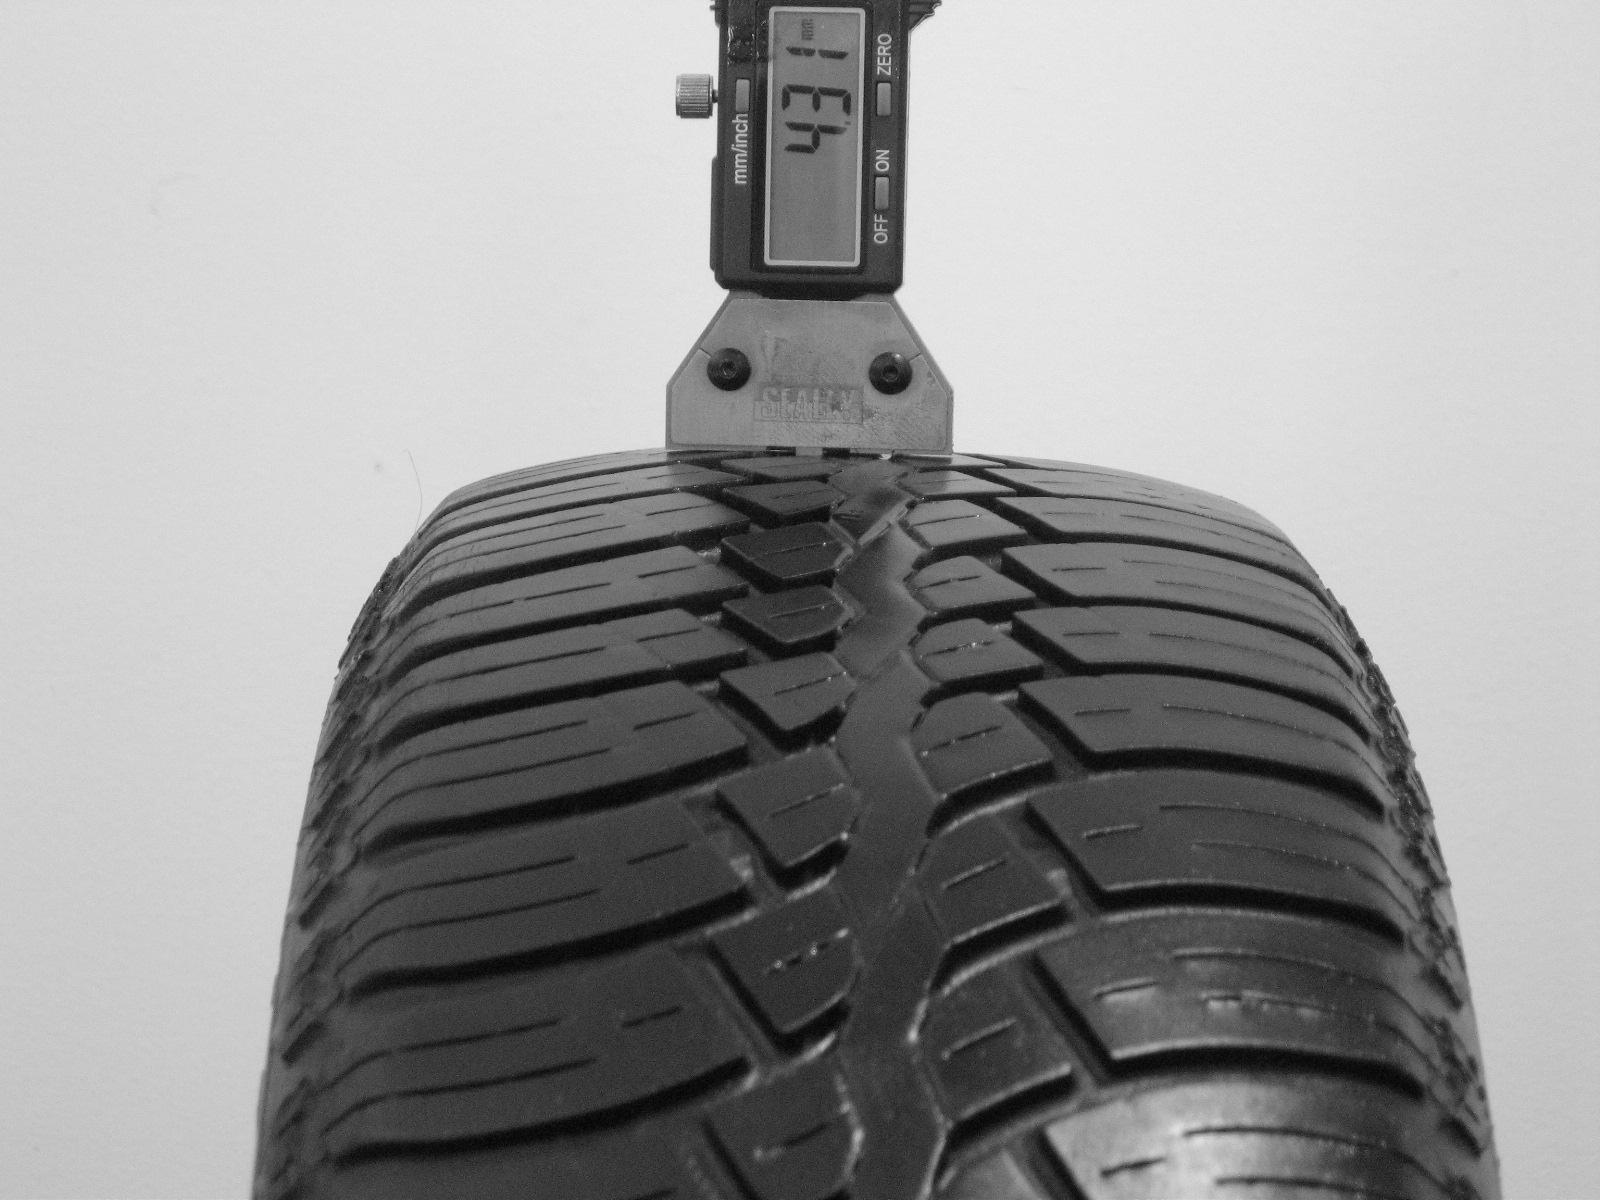 Použité-Pneu-Bazar - 165/65 R13 UNIROYAL RALLYE 380/65 -kusovka-rezerva 4mm